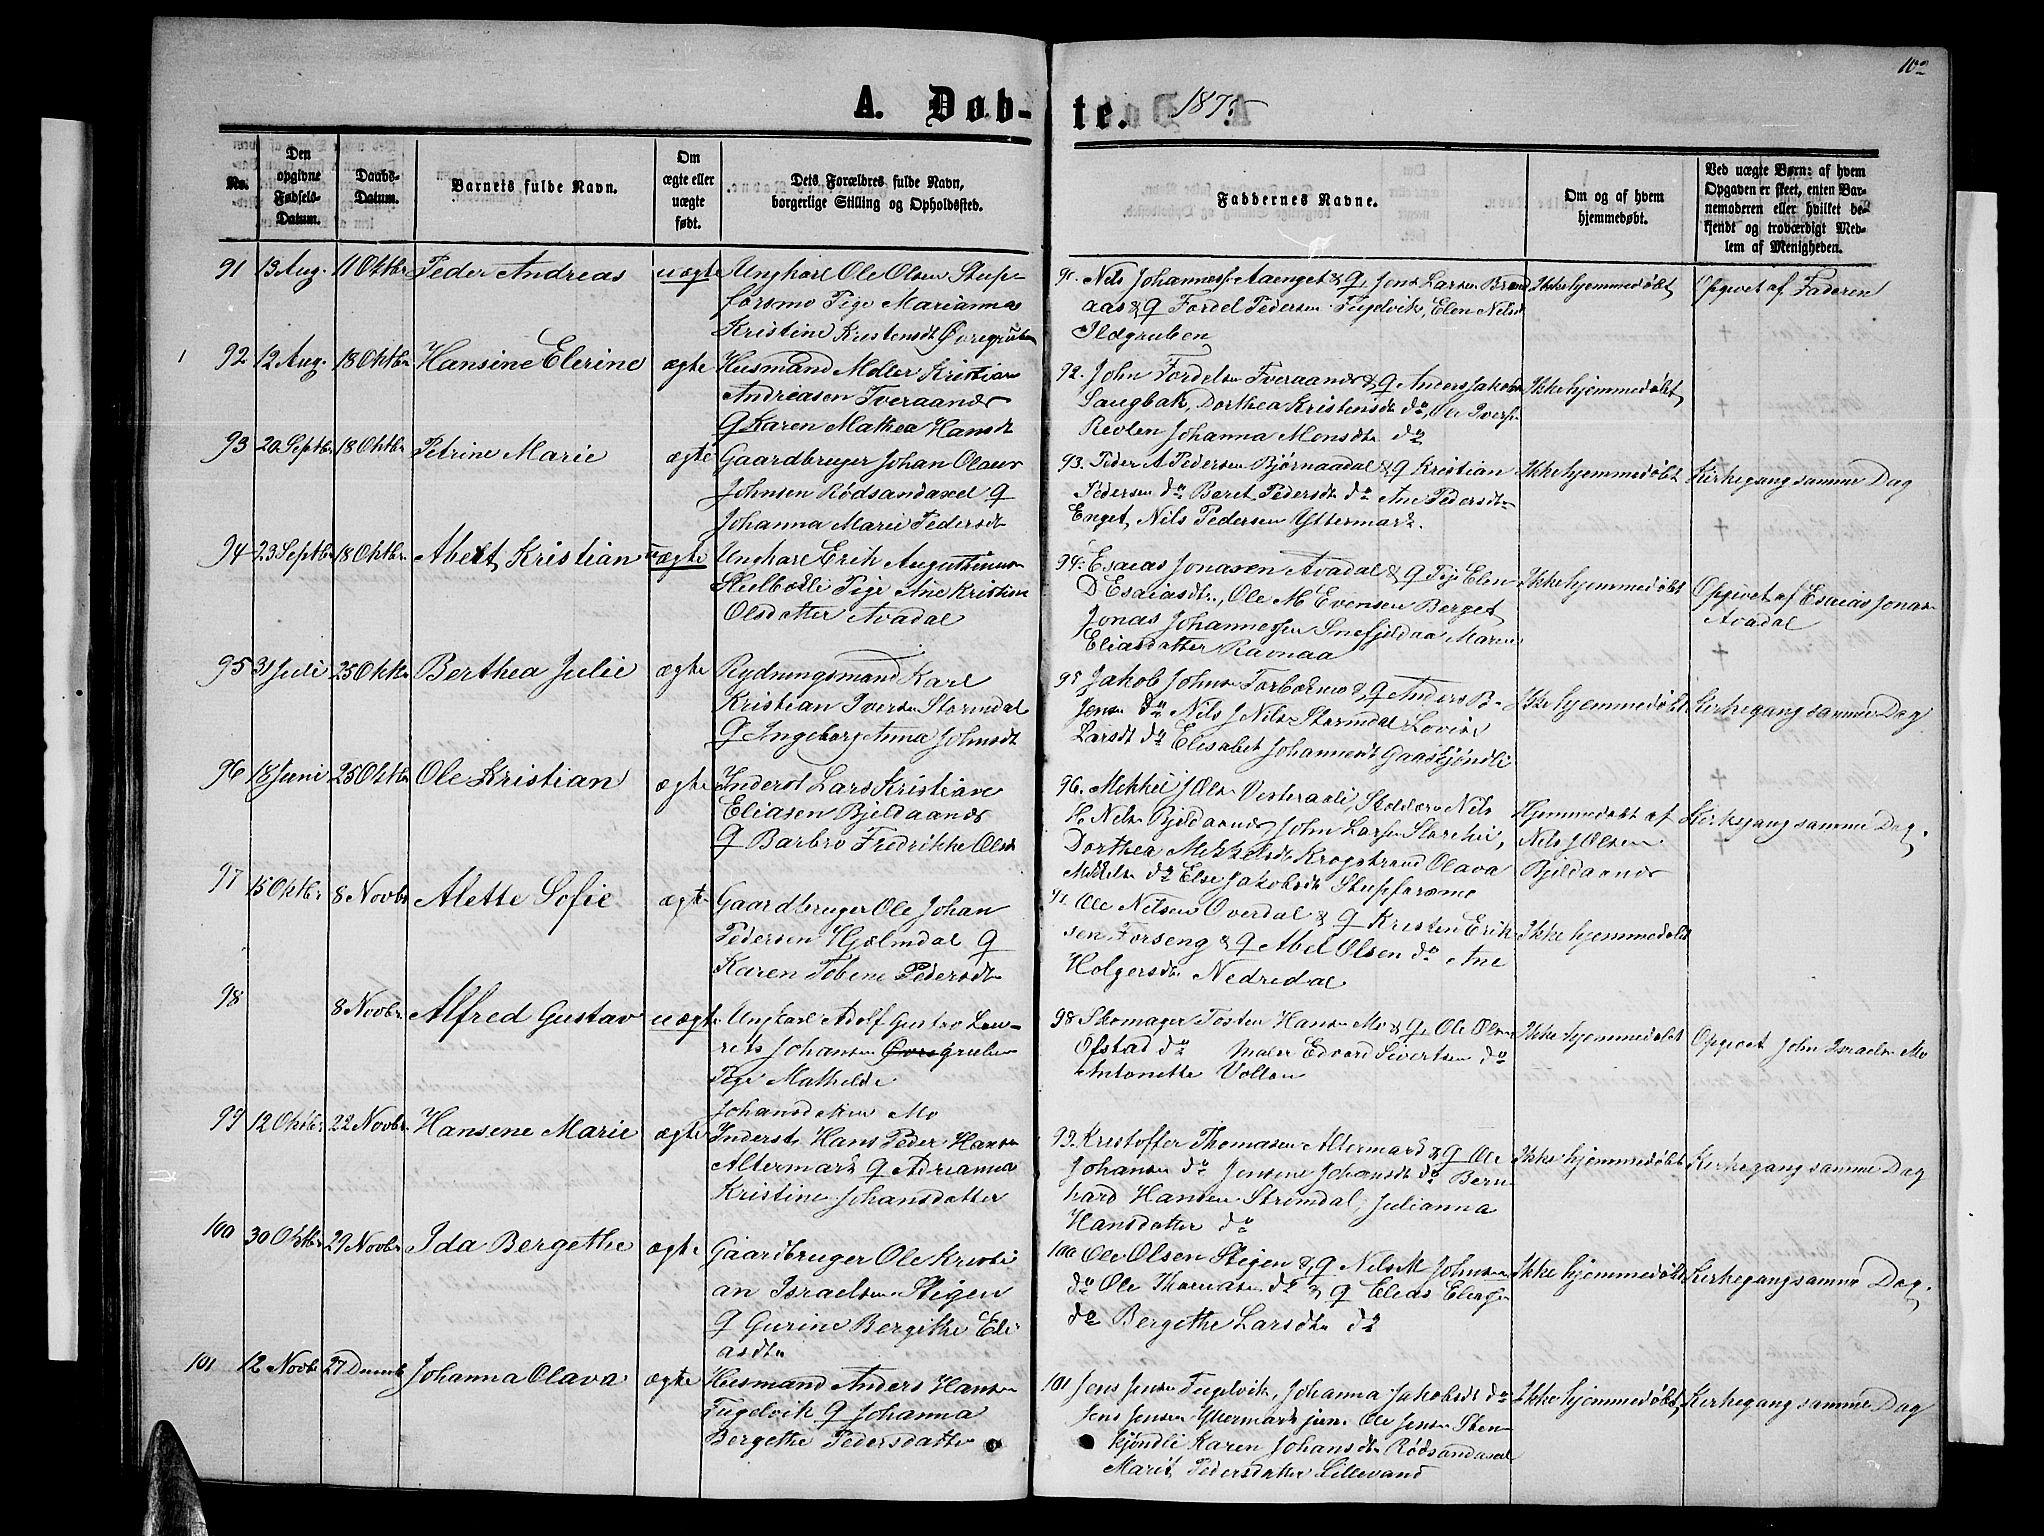 SAT, Ministerialprotokoller, klokkerbøker og fødselsregistre - Nordland, 827/L0415: Klokkerbok nr. 827C04, 1864-1886, s. 102